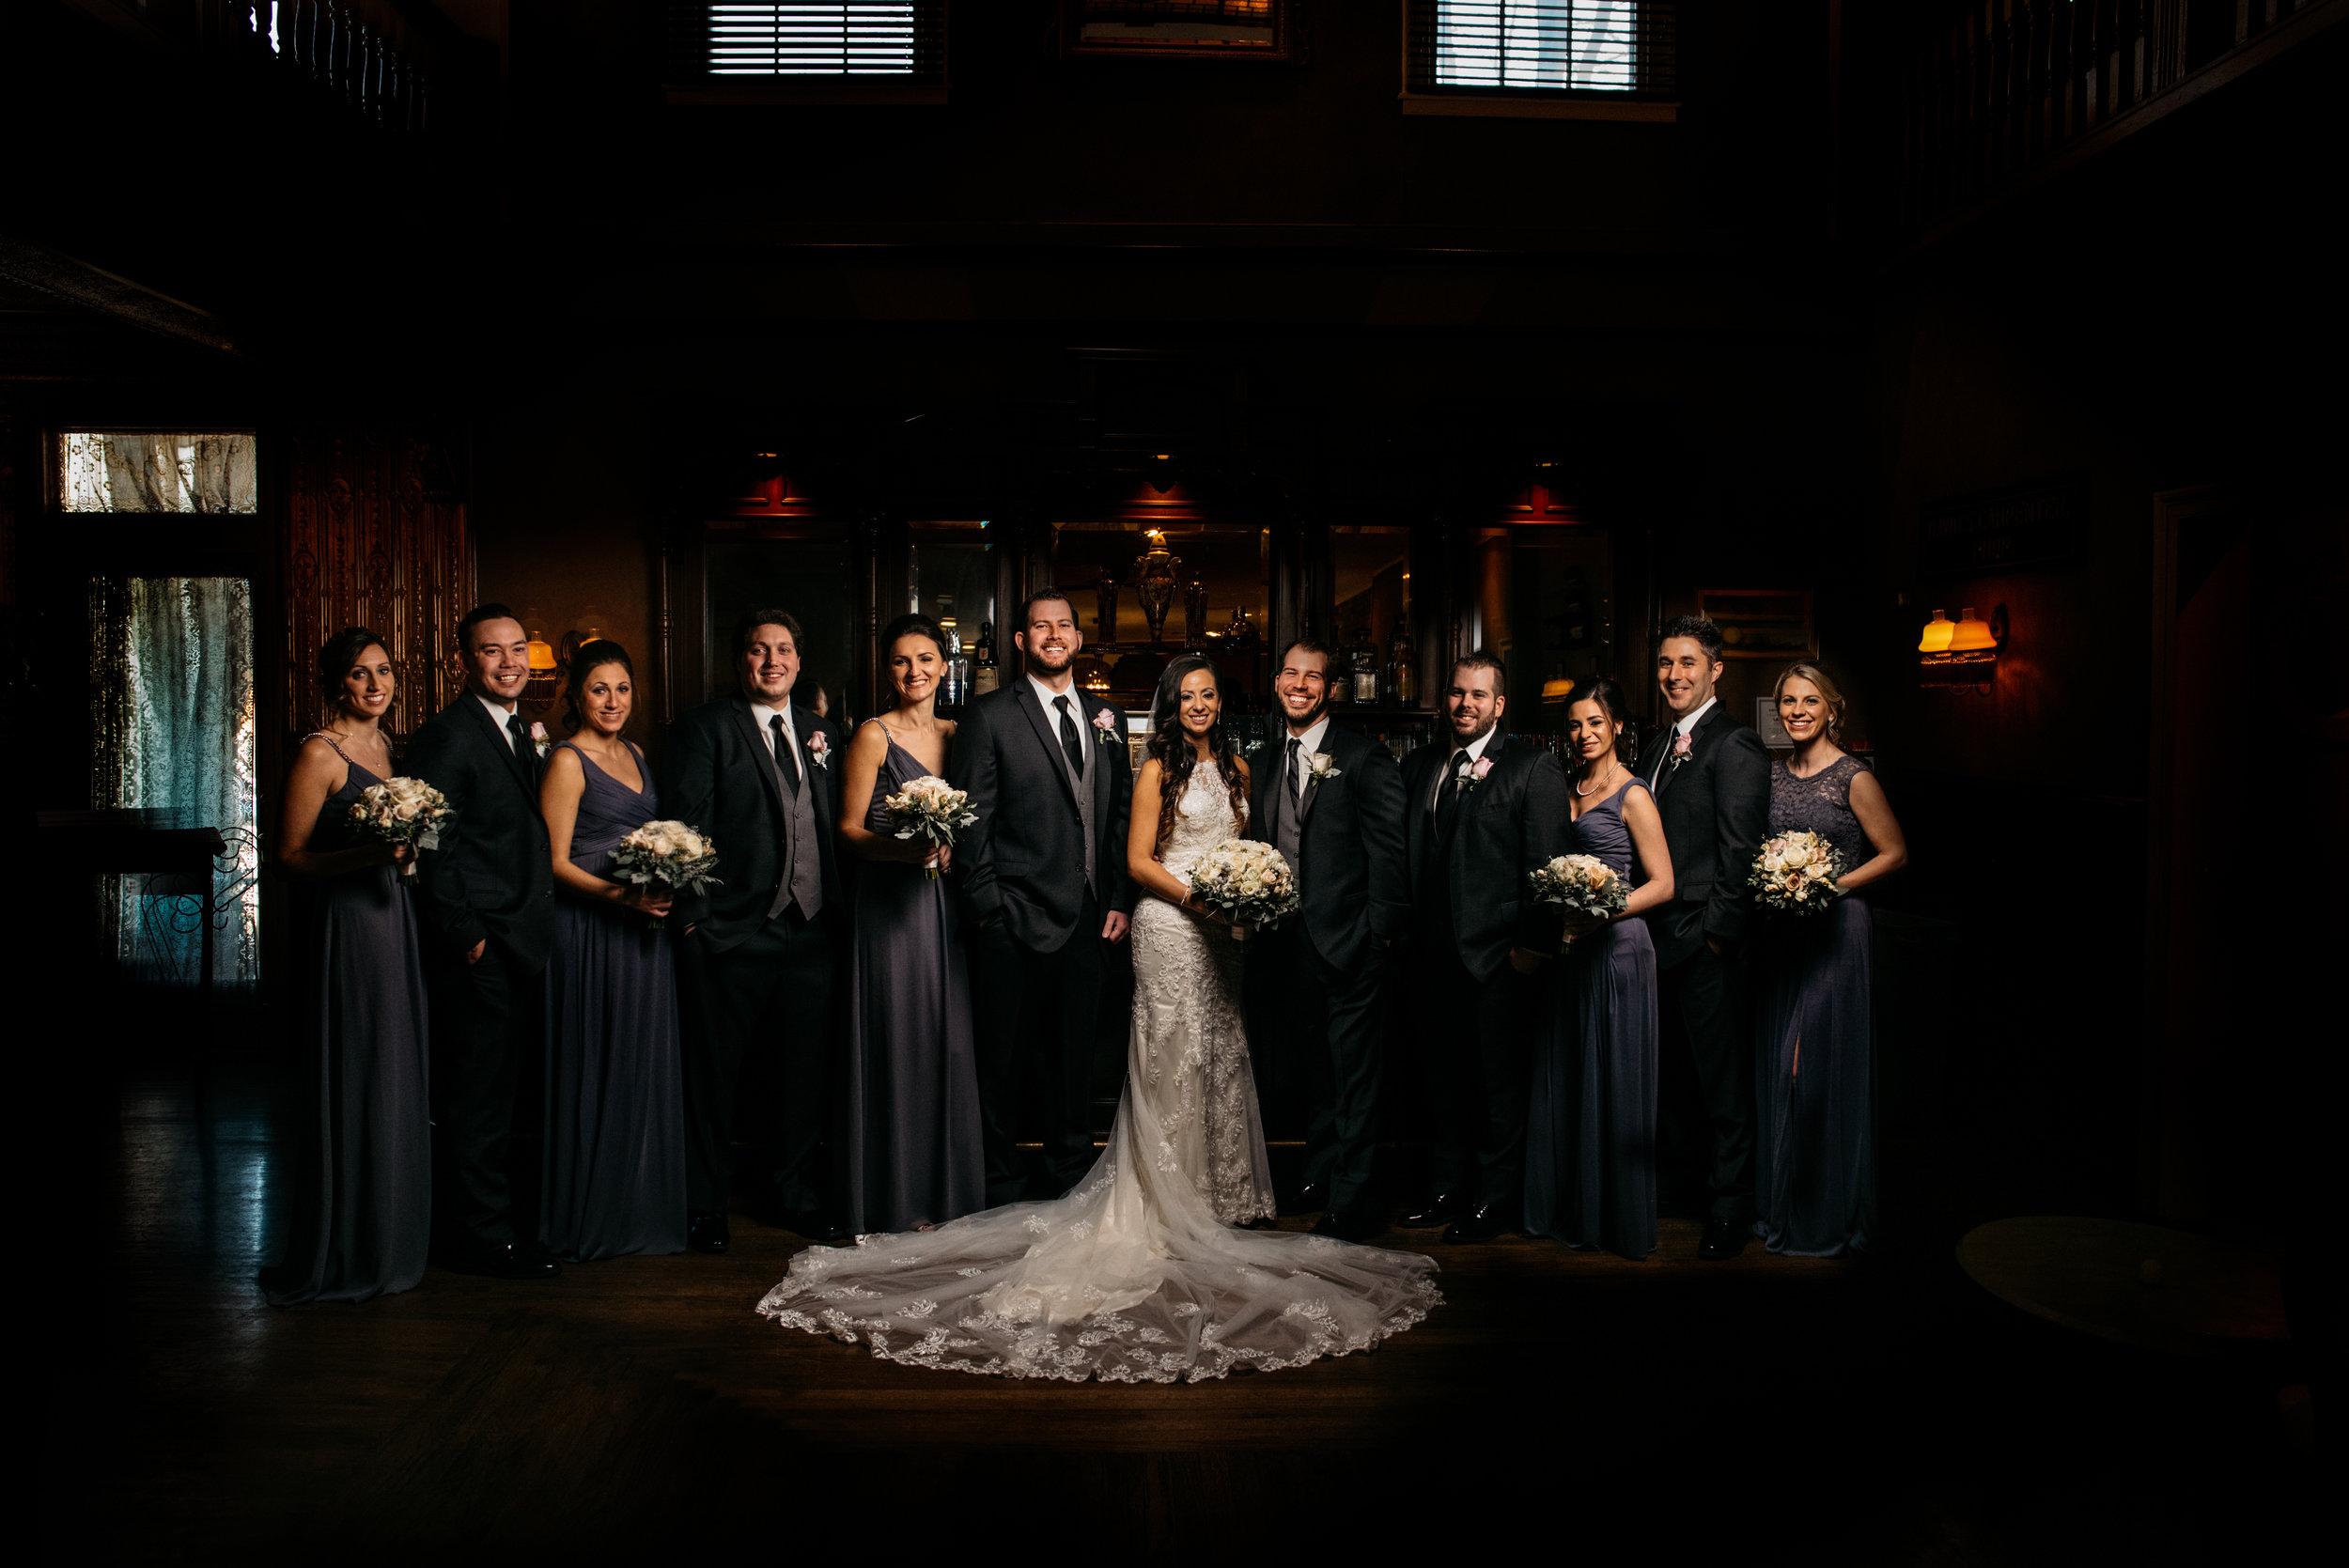 WeddingPhotos | NJPhotographer | Highlights-1-5.jpg